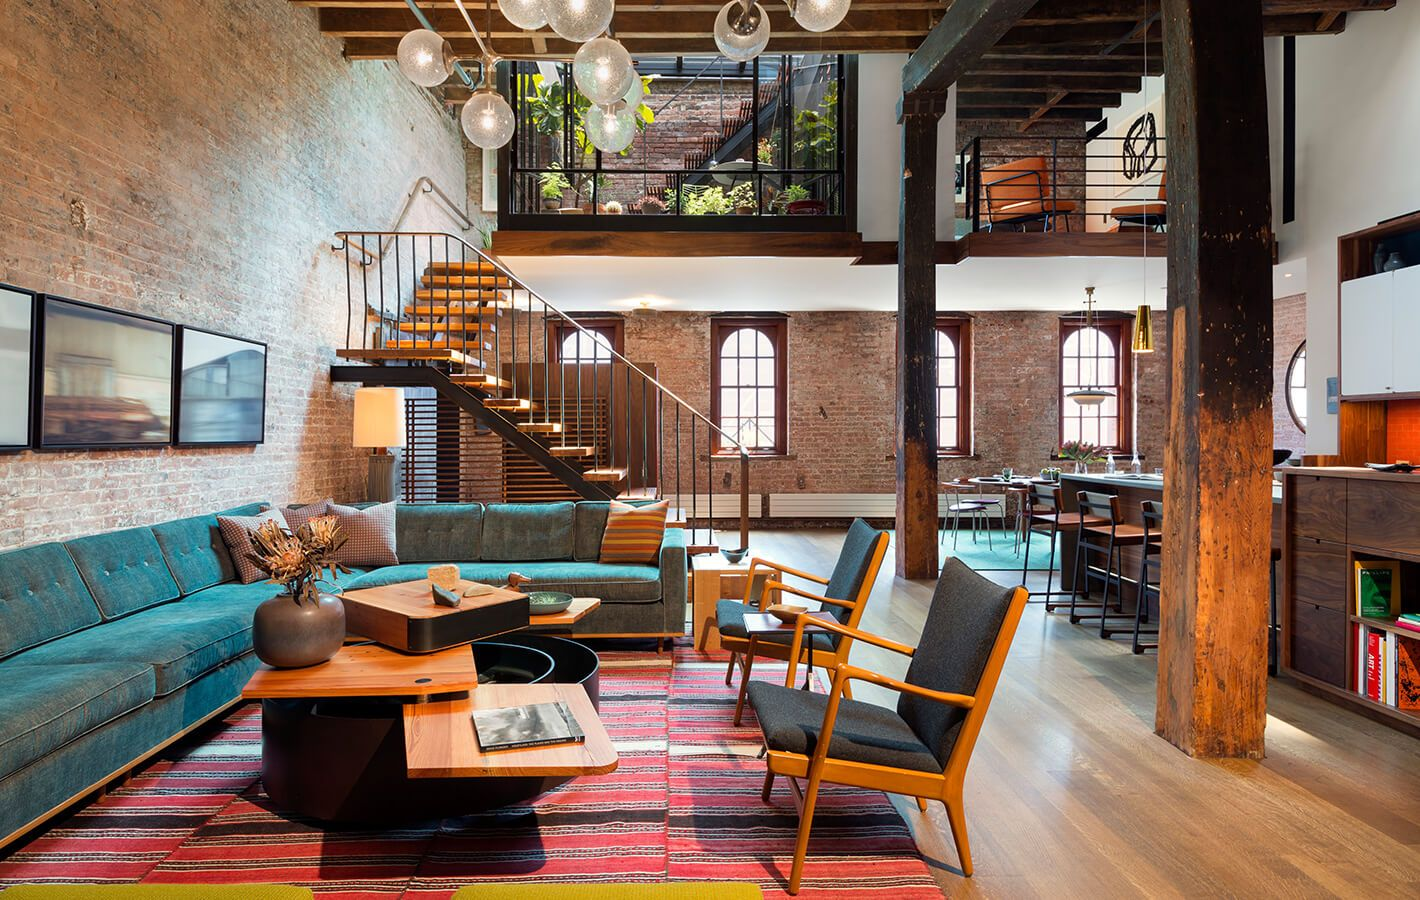 Tribeca Loft Architecture Interiors Terrace Green Roof Renovation Historic Building Nyc Loft Design Loft Living Home